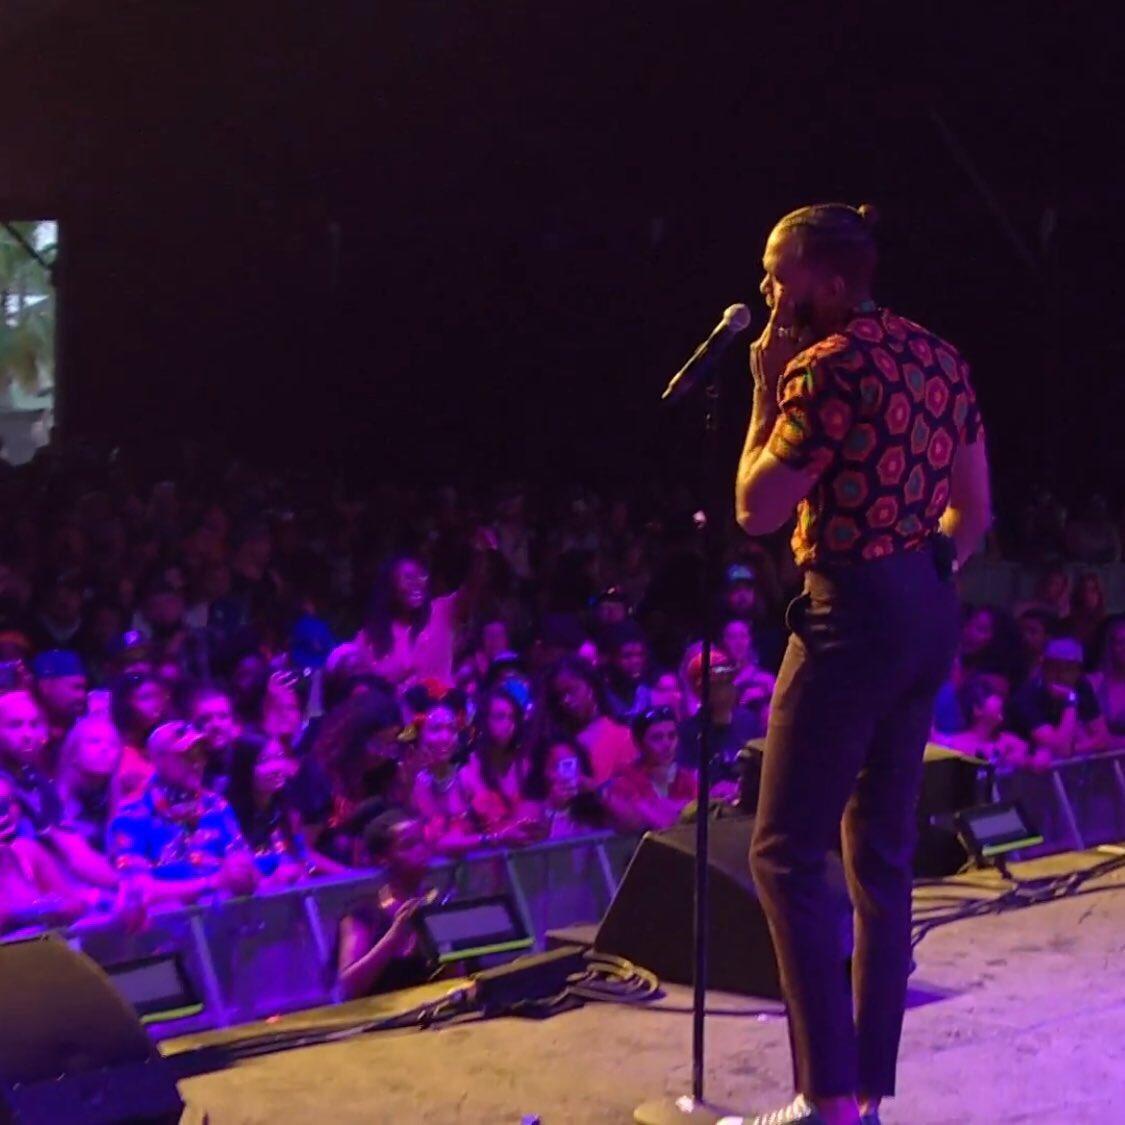 .@Wondaland Artist @Jidenna is Live At #Coachella18 https://t.co/PdN5r7Aftb